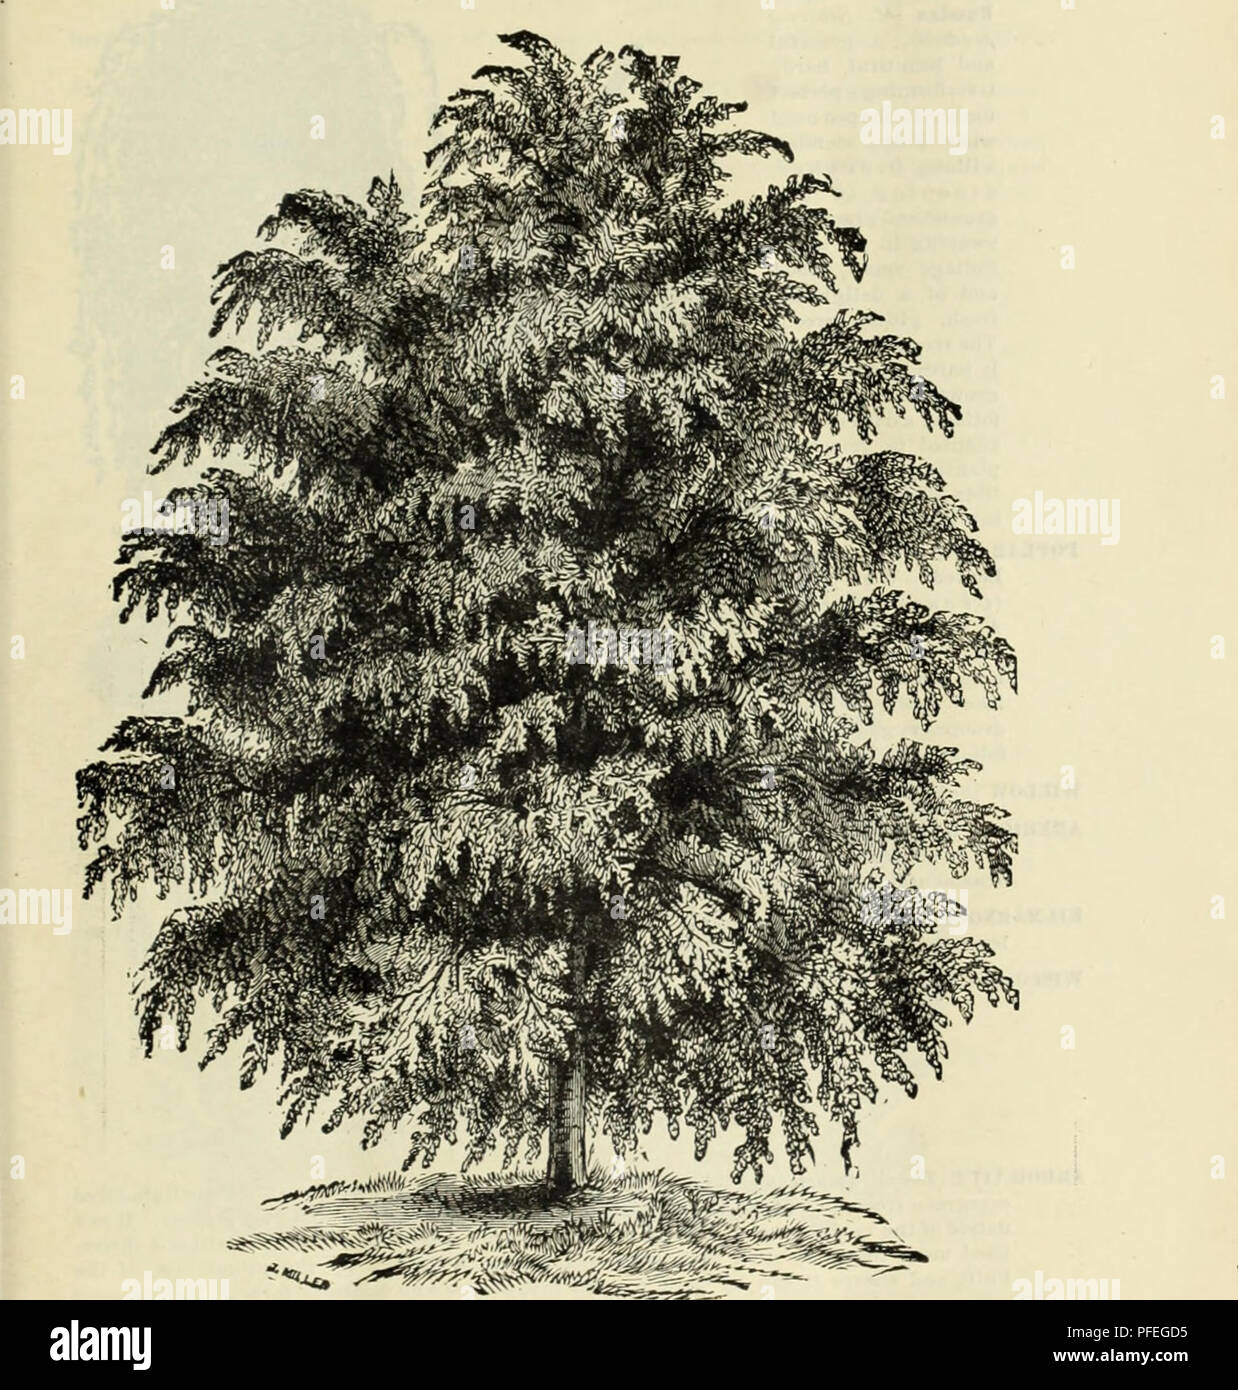 Small Ornamental Trees For Kansas: Weeping Ash Tree Stock Photos & Weeping Ash Tree Stock